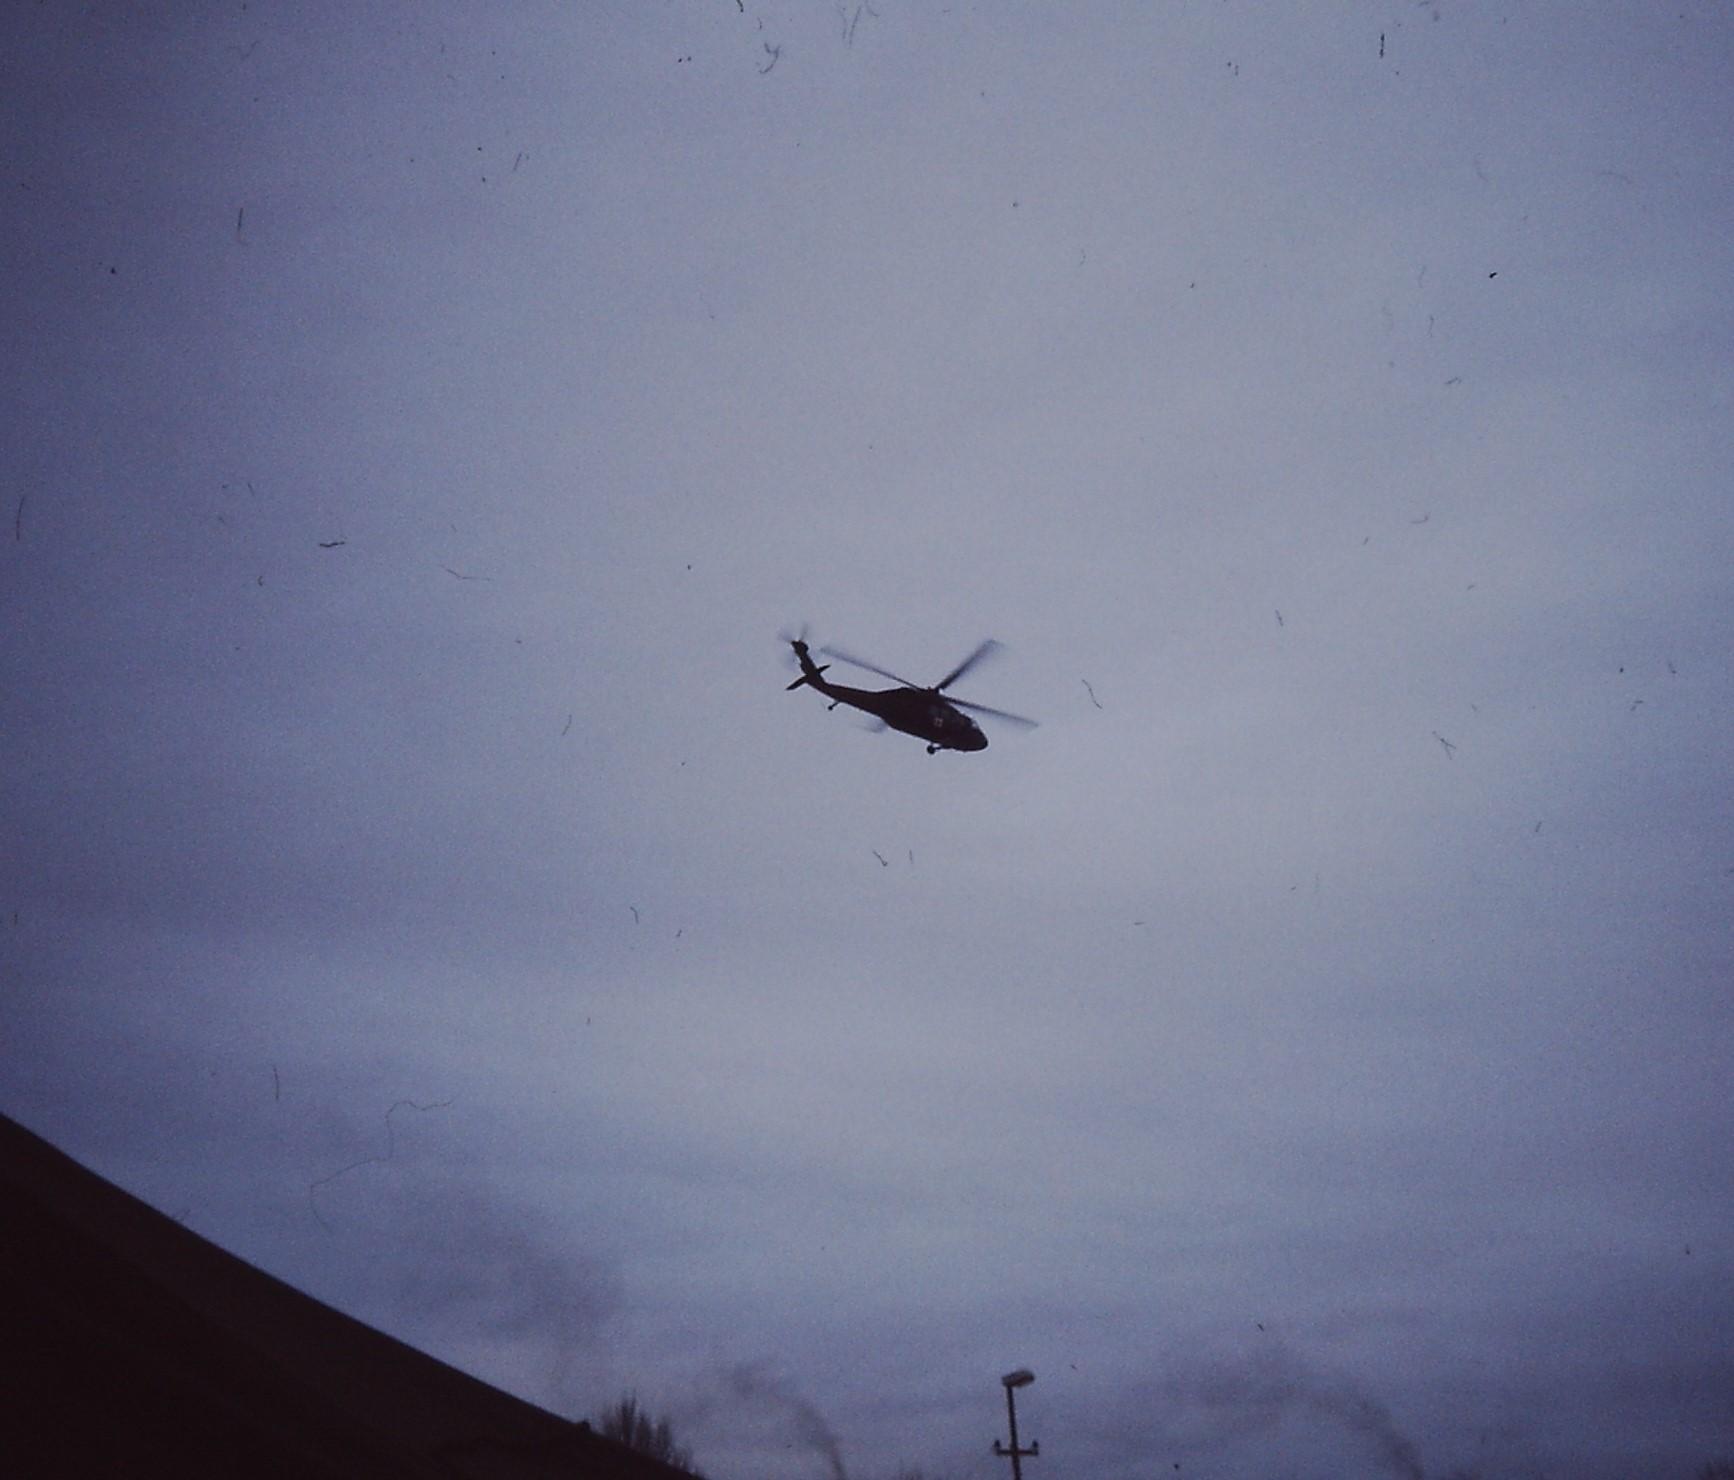 HellicopterPICT0151-2.jpg